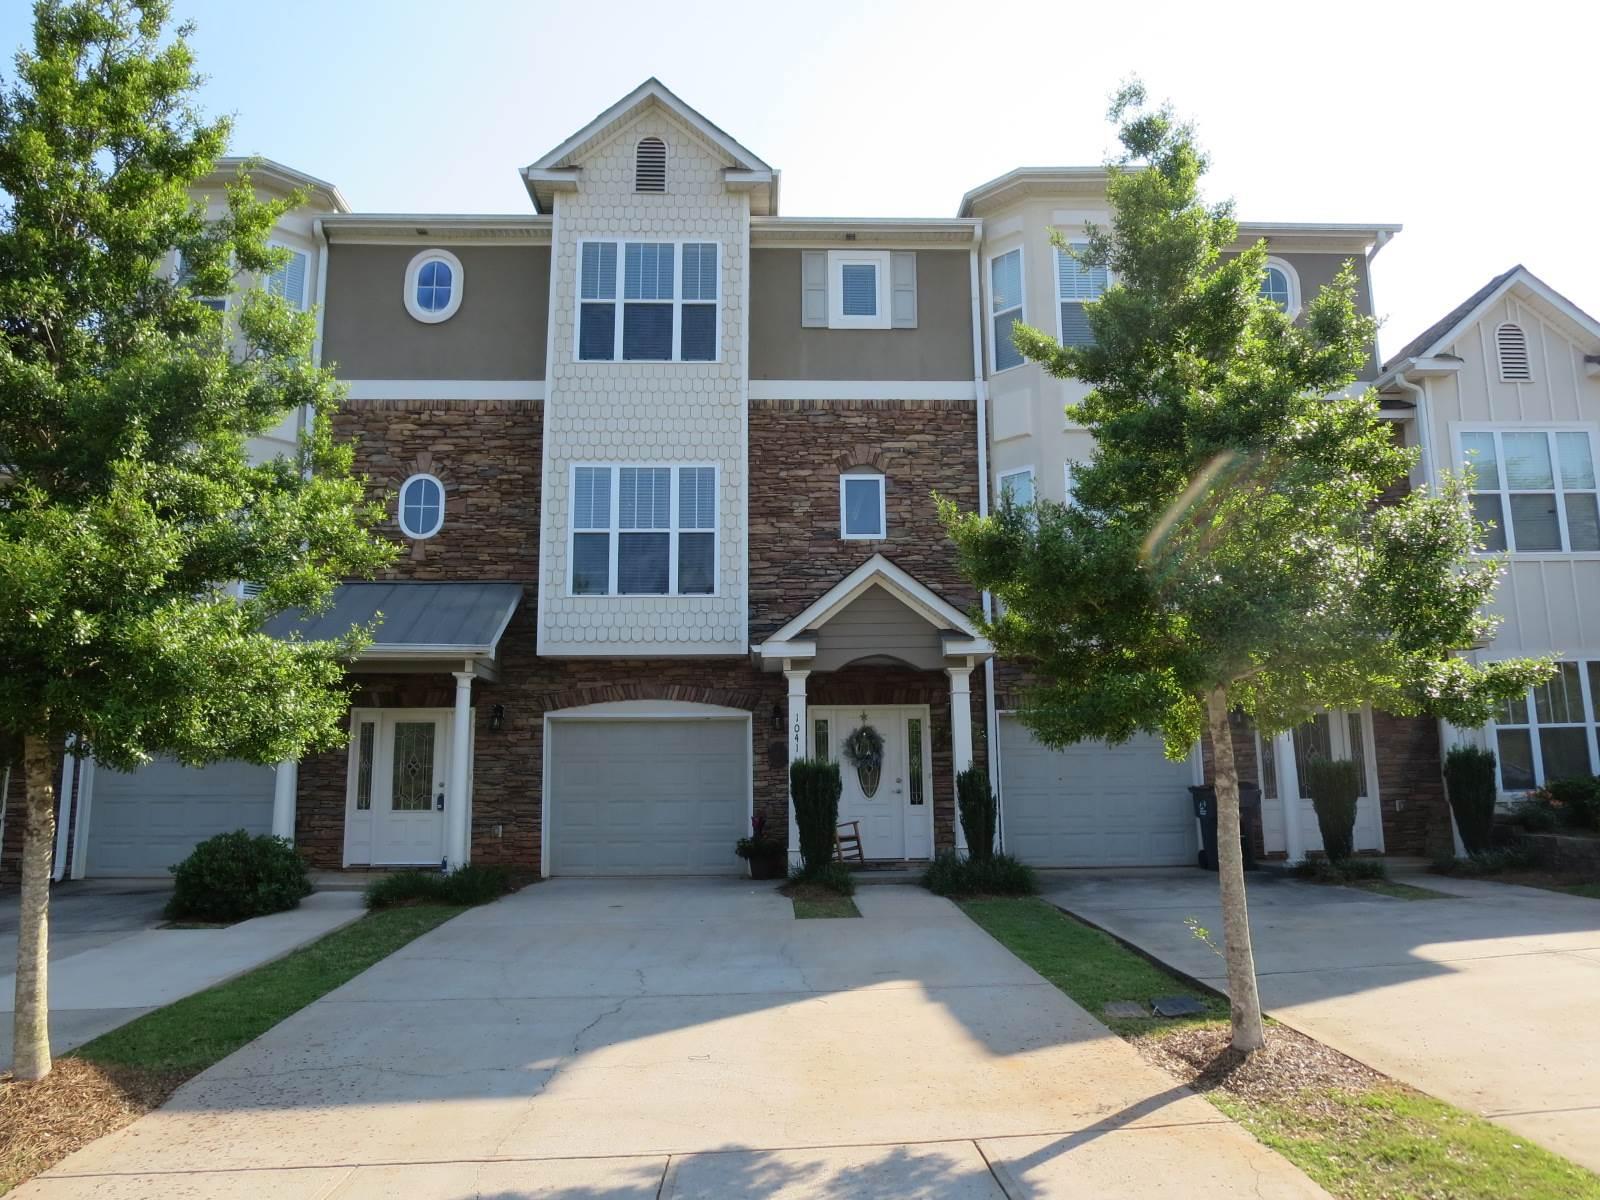 1041 APPLE ORCHARD LANE, Lake Oconee in Greene County, GA 30642 Home for Sale